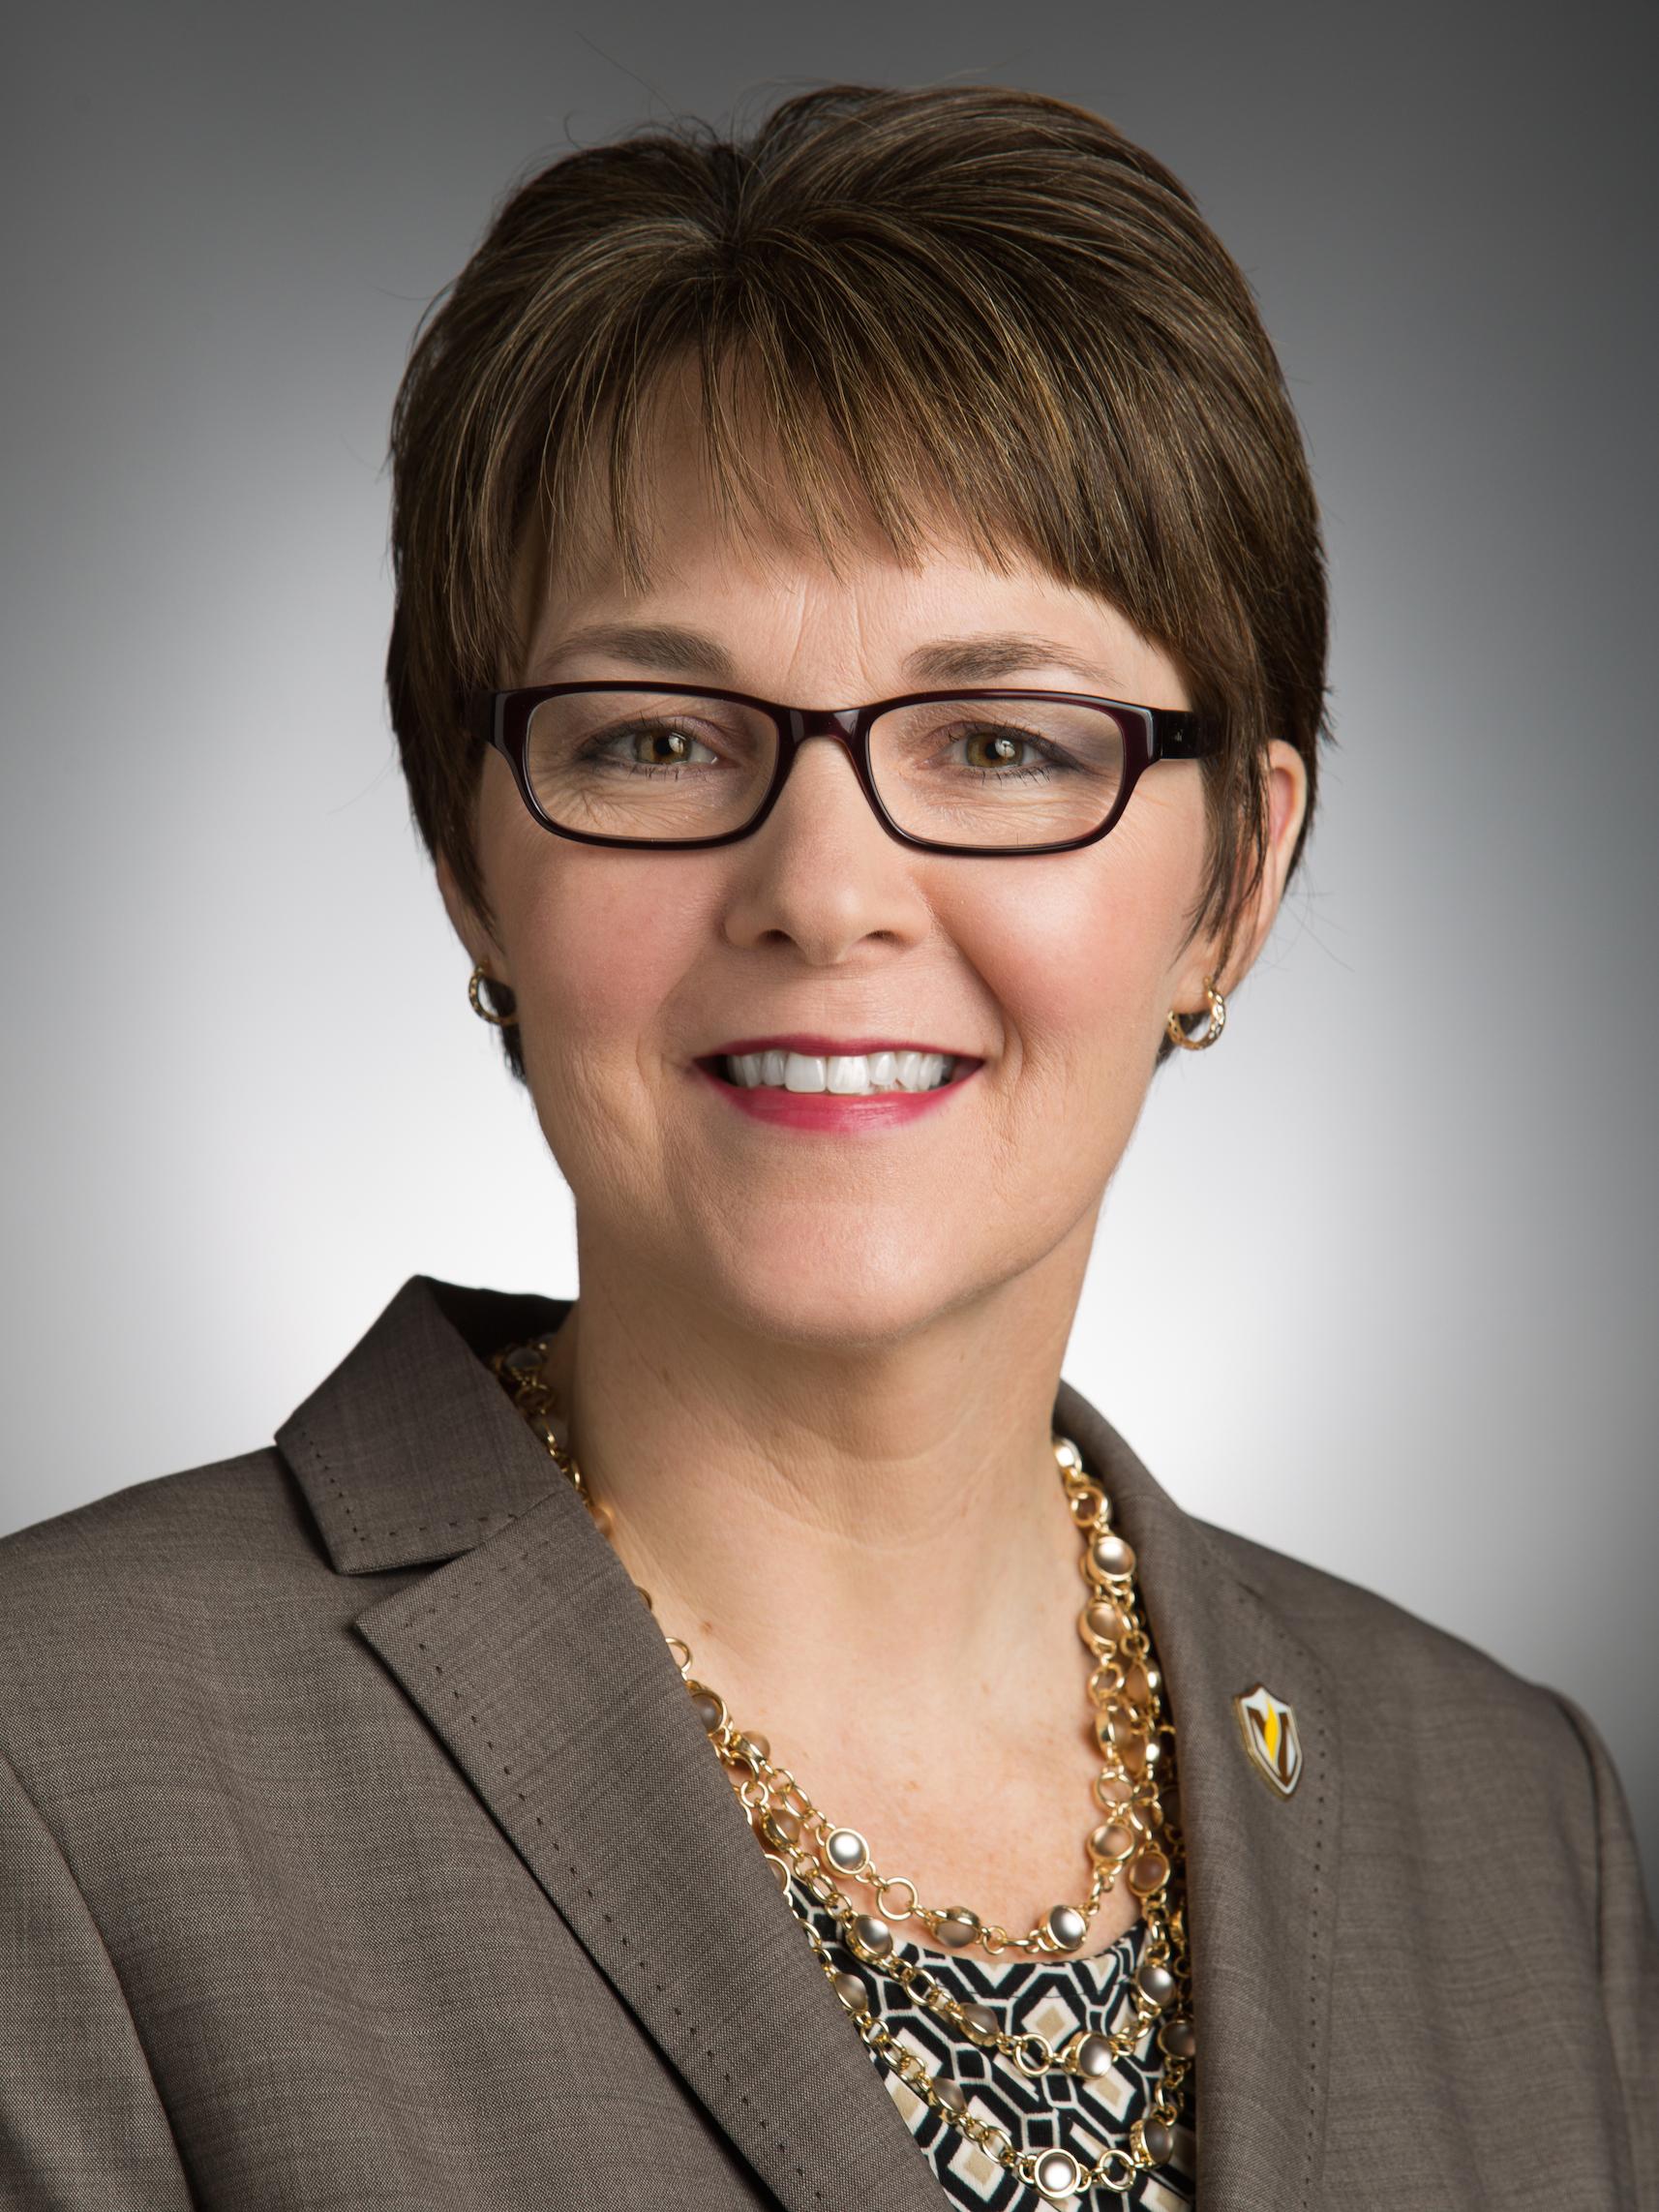 Jennifer A. Ziegler